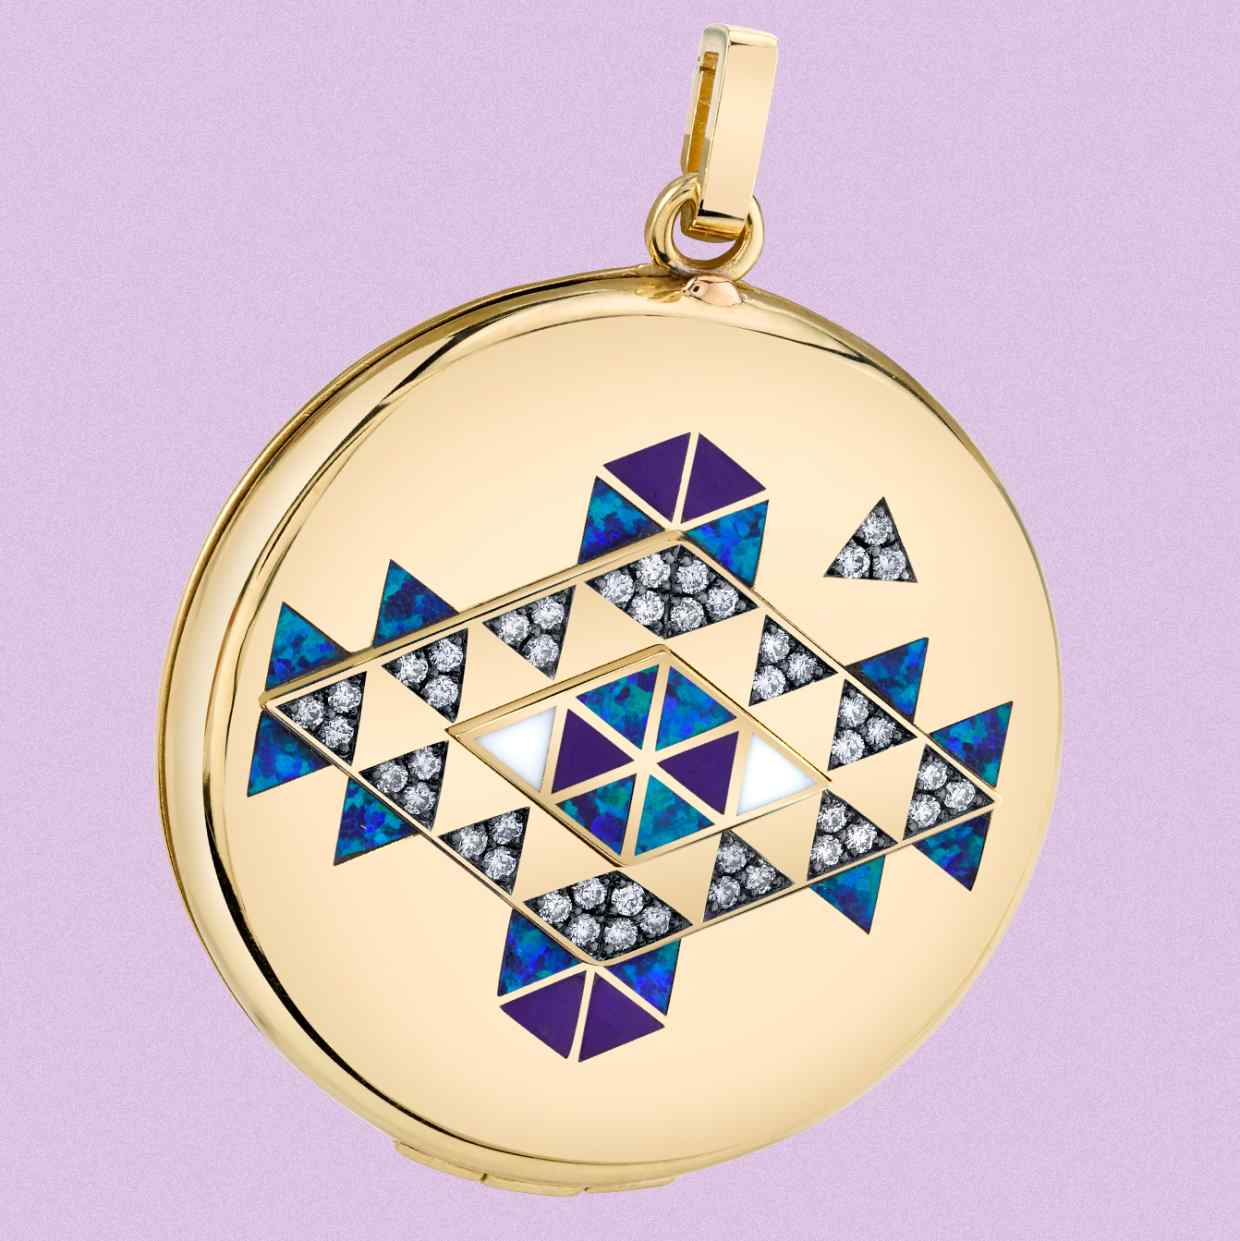 Harwell Godfrey gold, opal, onyx, pavé diamond and enamel Vida Fire locket with solid perfume, $14,500